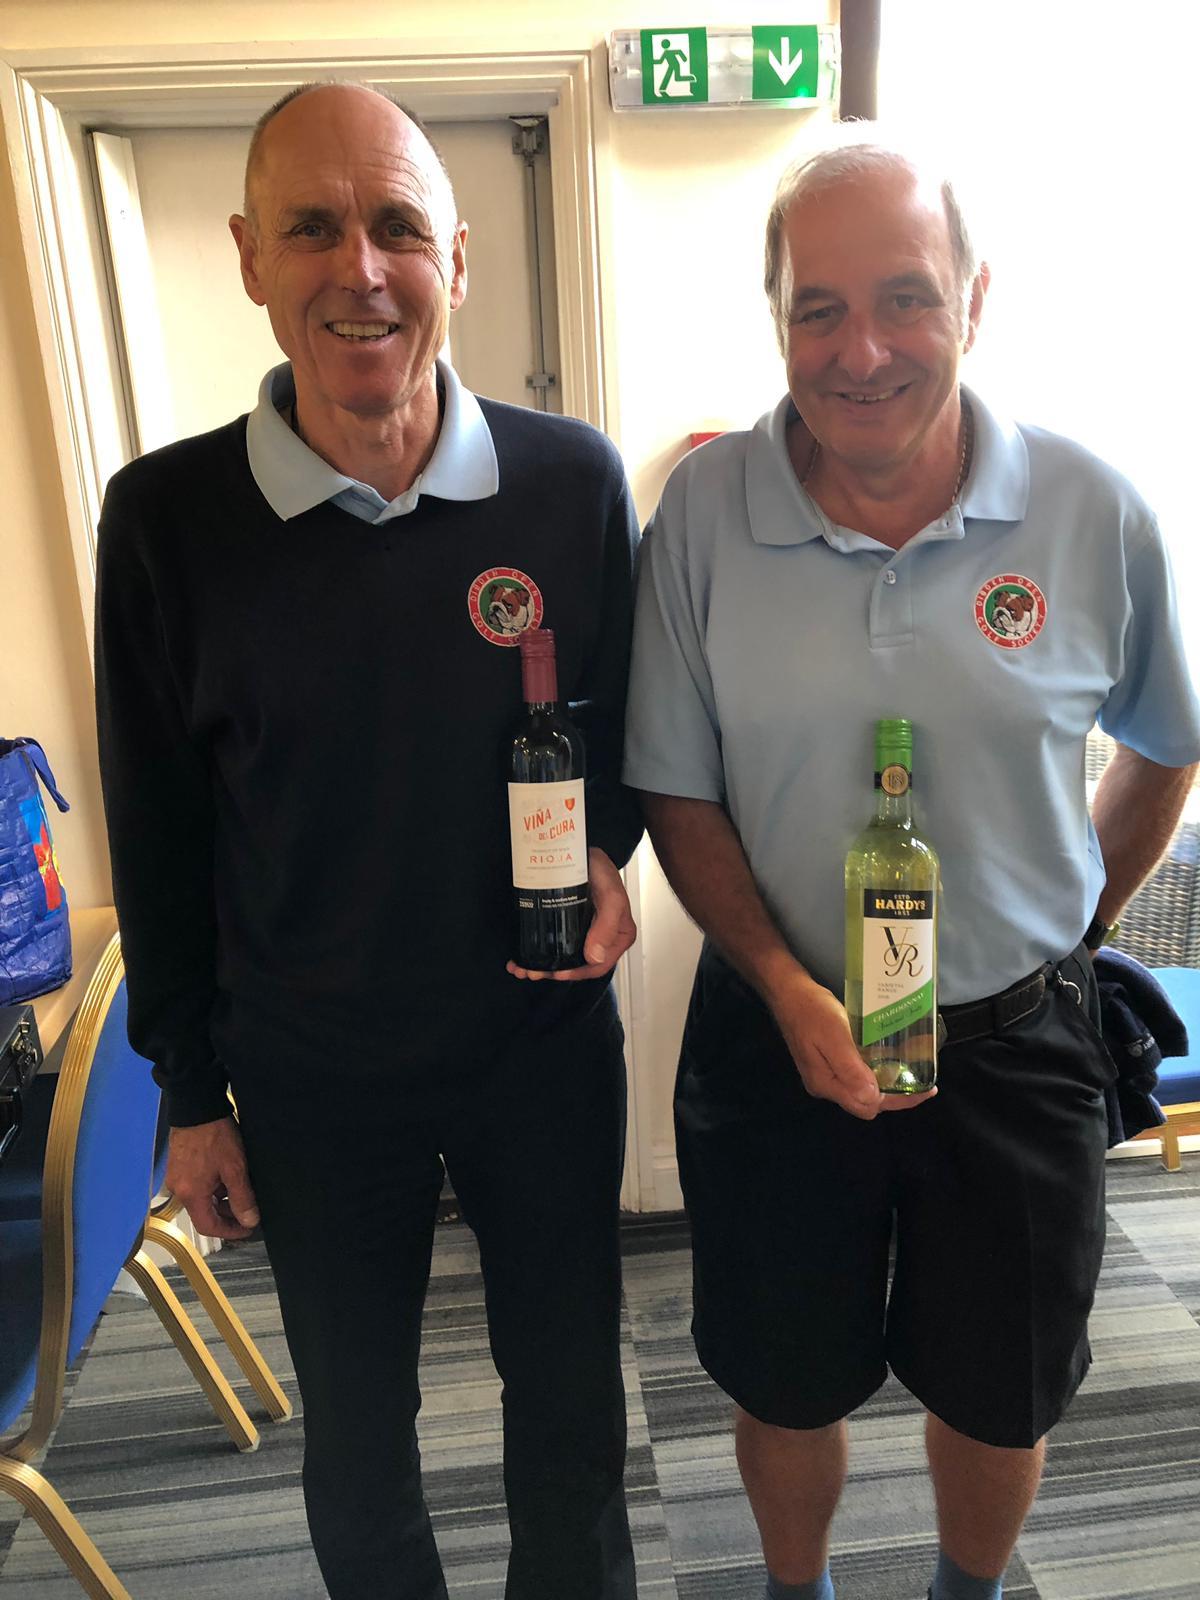 1 Oct: -Wine-winners-L-to-R-P-Wastell-C-Viney.-D-Wilkins-not-shown